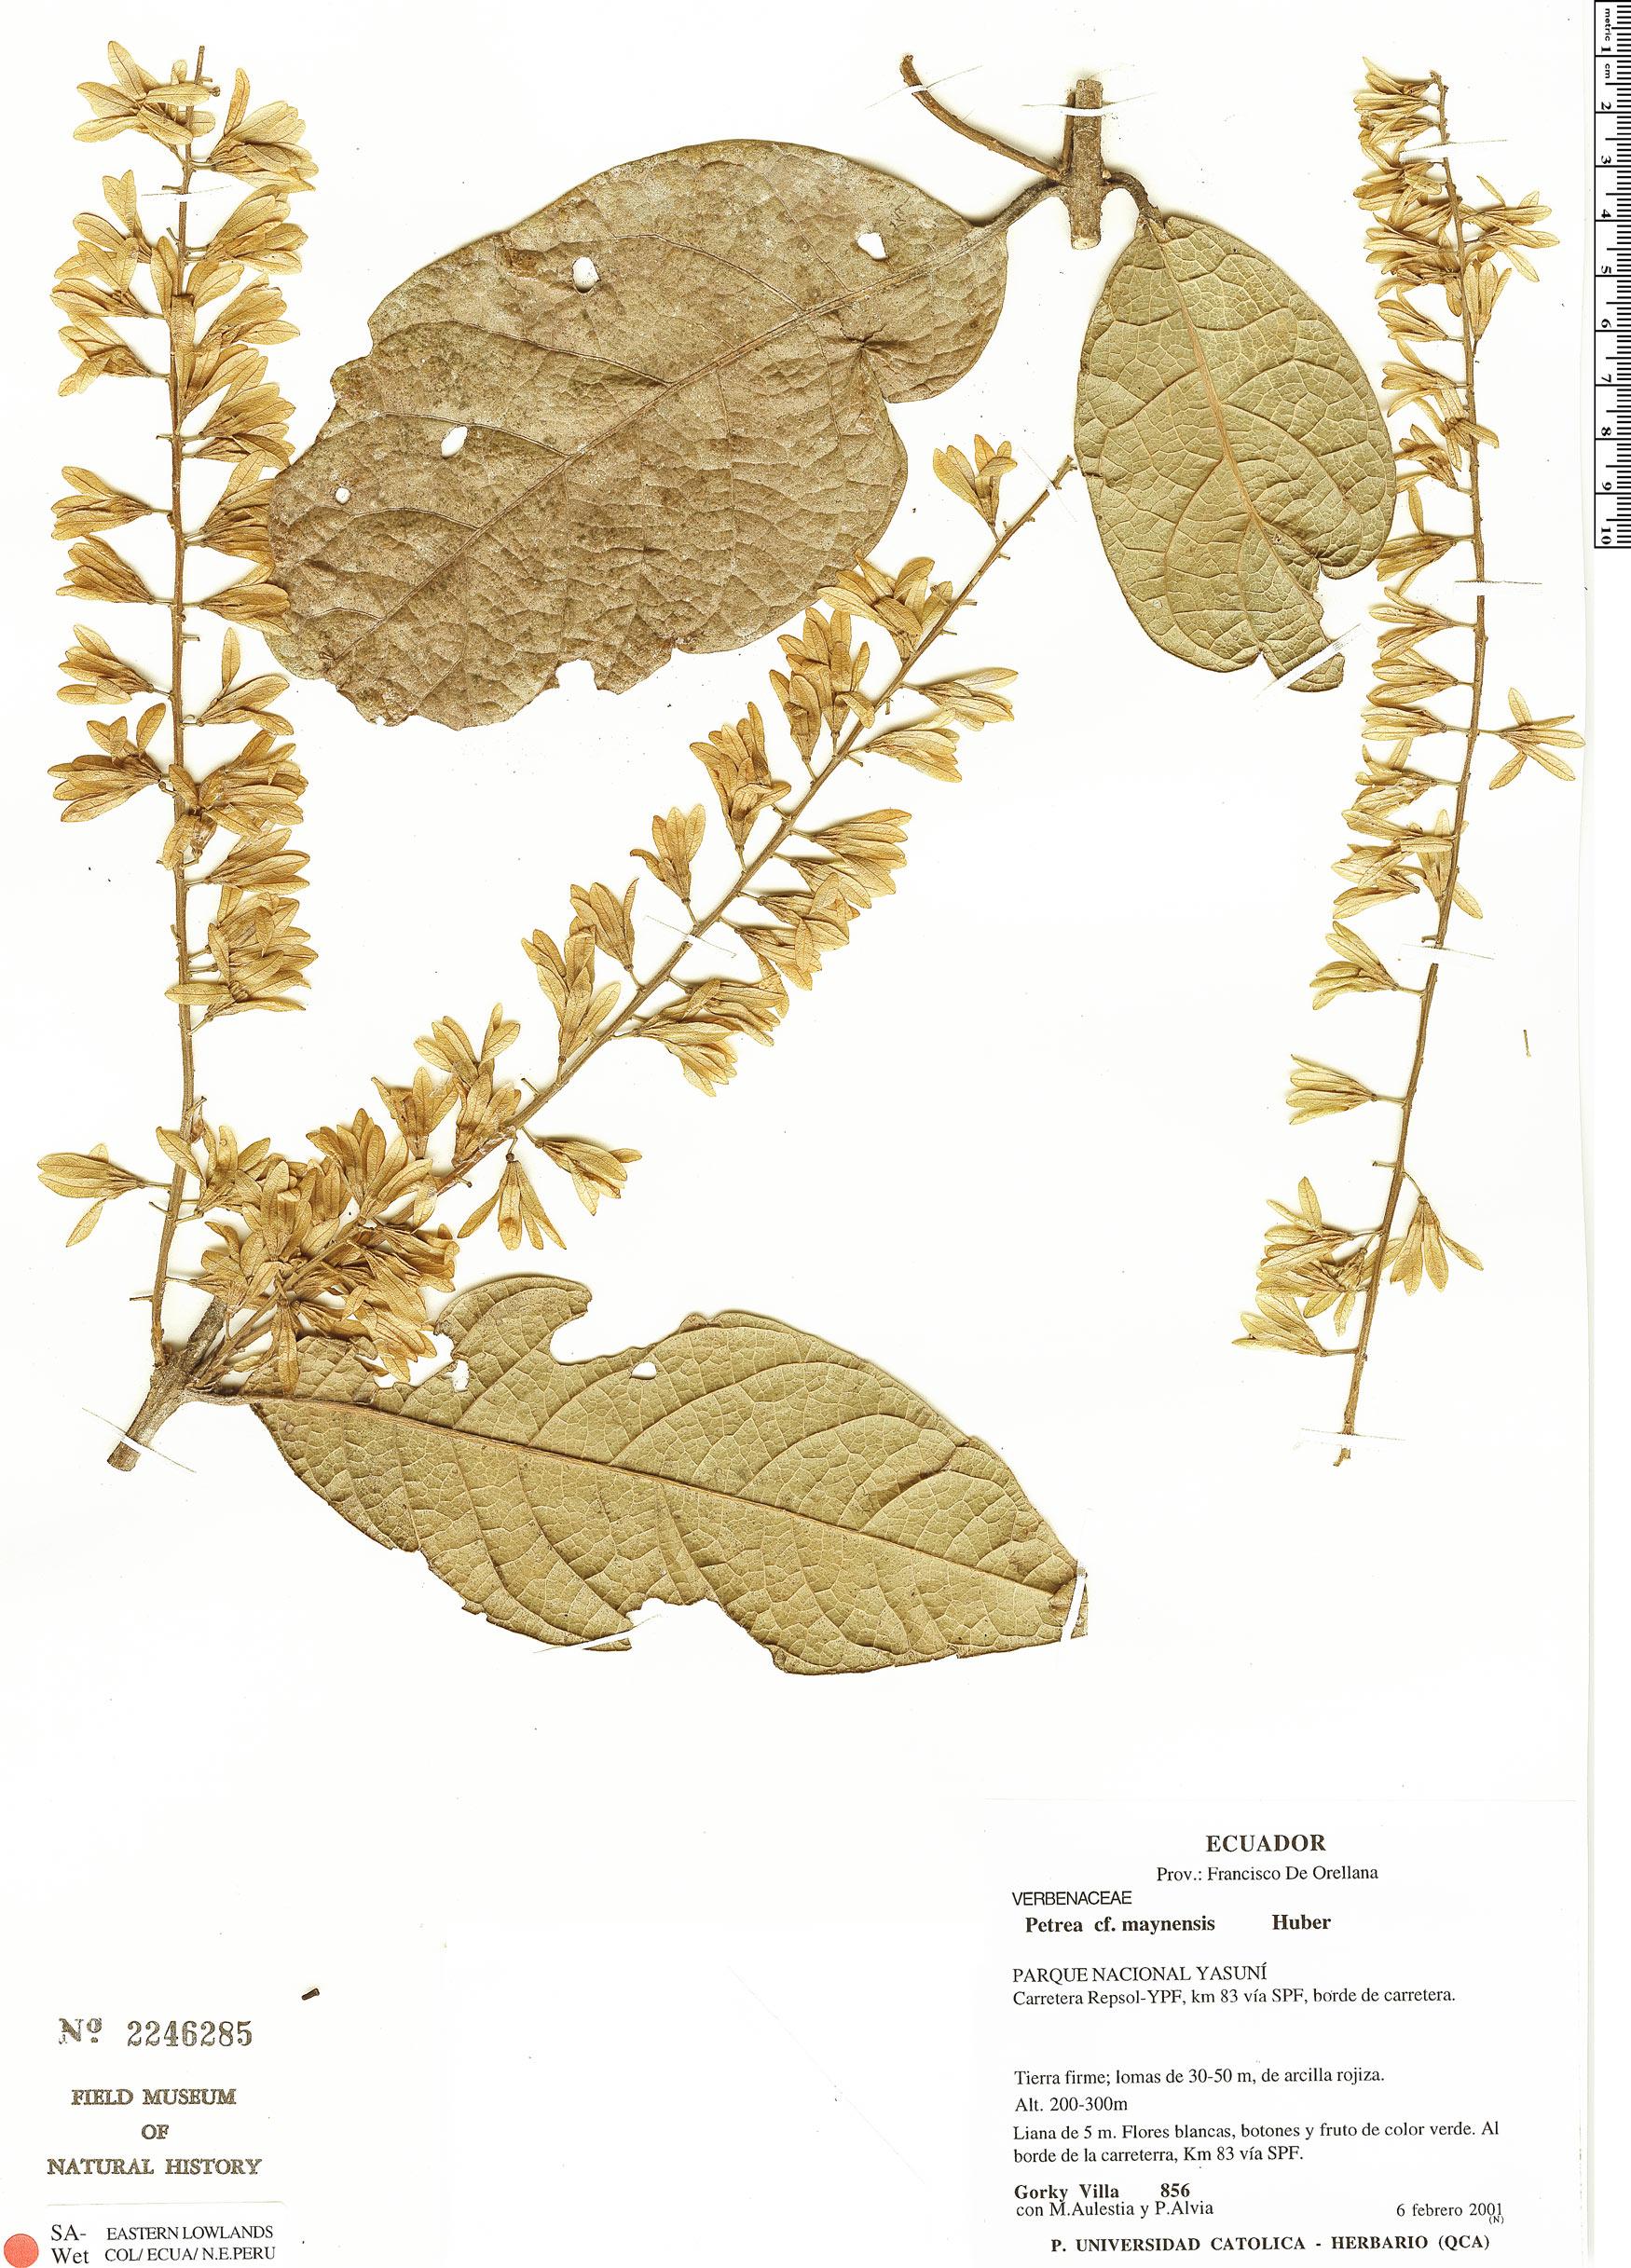 Specimen: Petrea maynensis